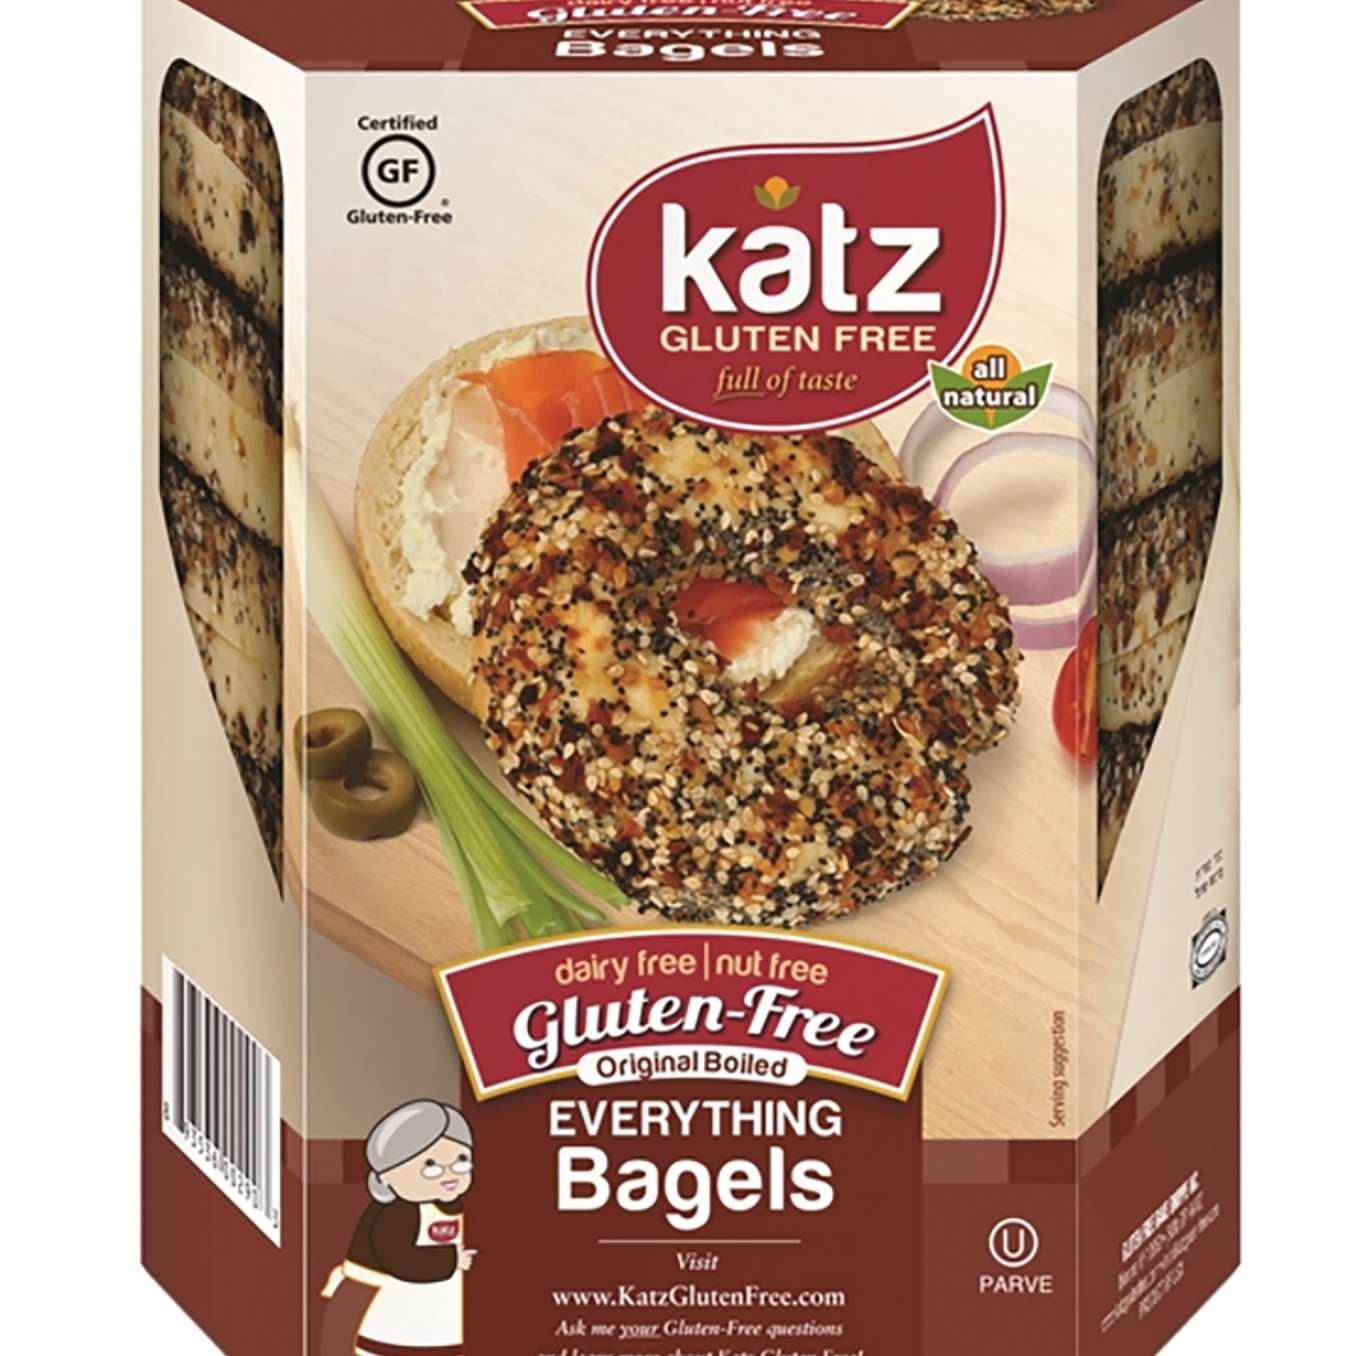 Katz gluten-free bagels